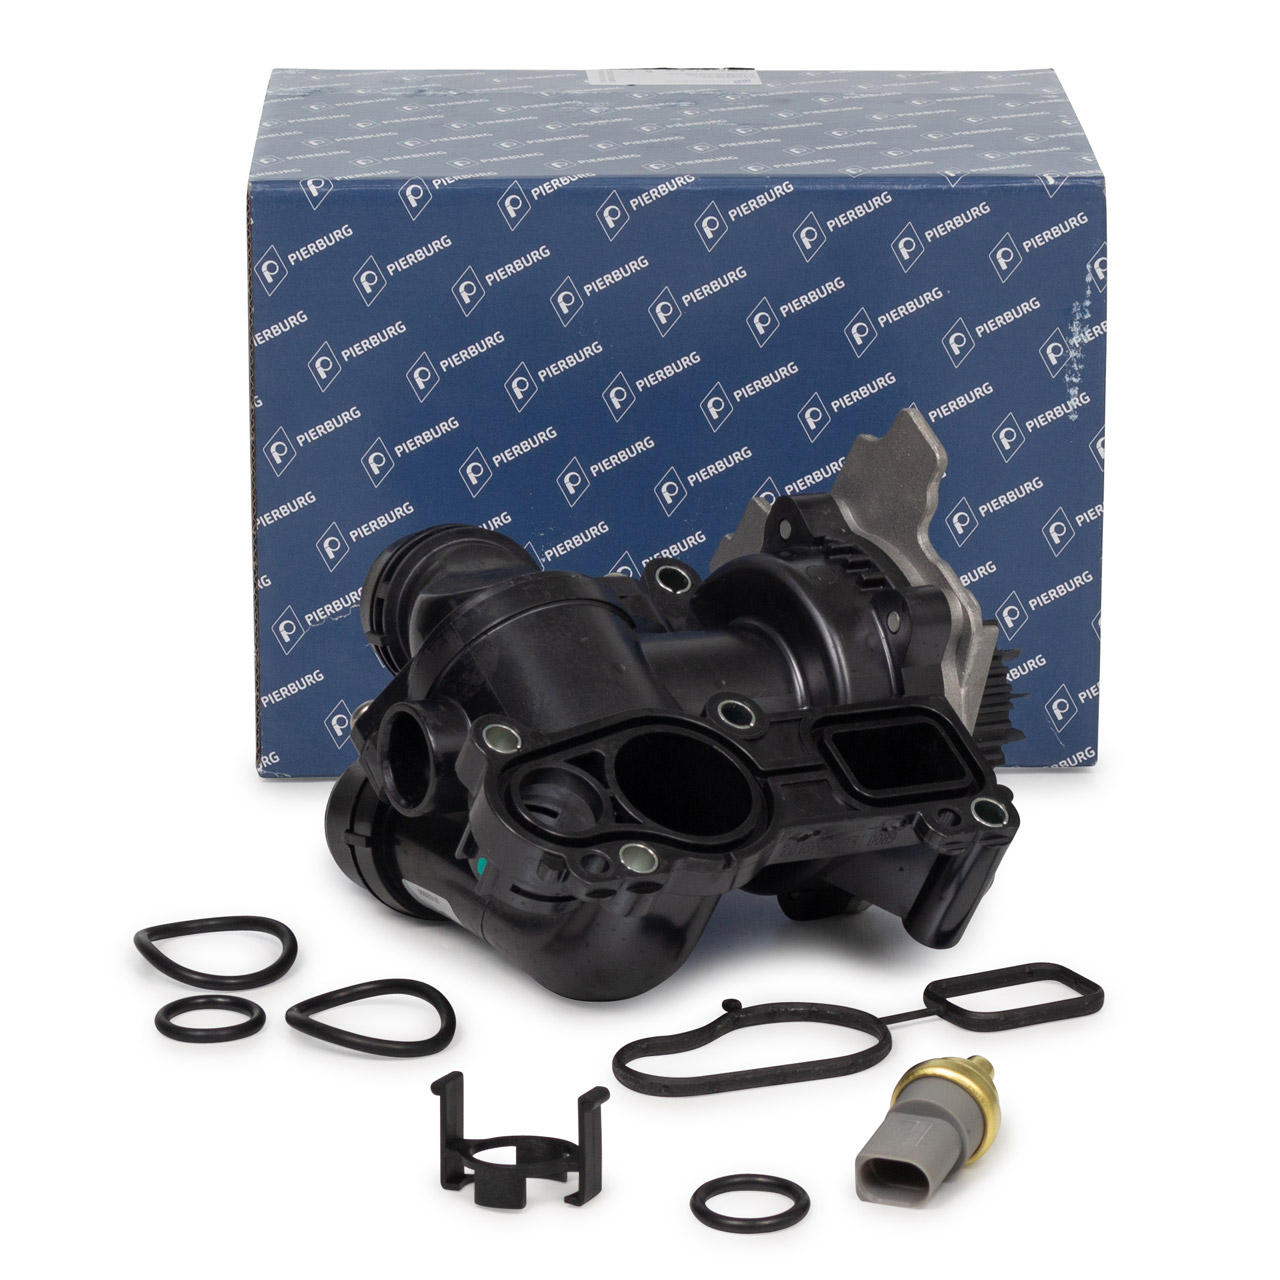 PIERBURG Wasserpumpe Thermostat Dichtung AUDI A3 8P SKODA VW Golf 5 6 2.0 GTI 06J121026BG